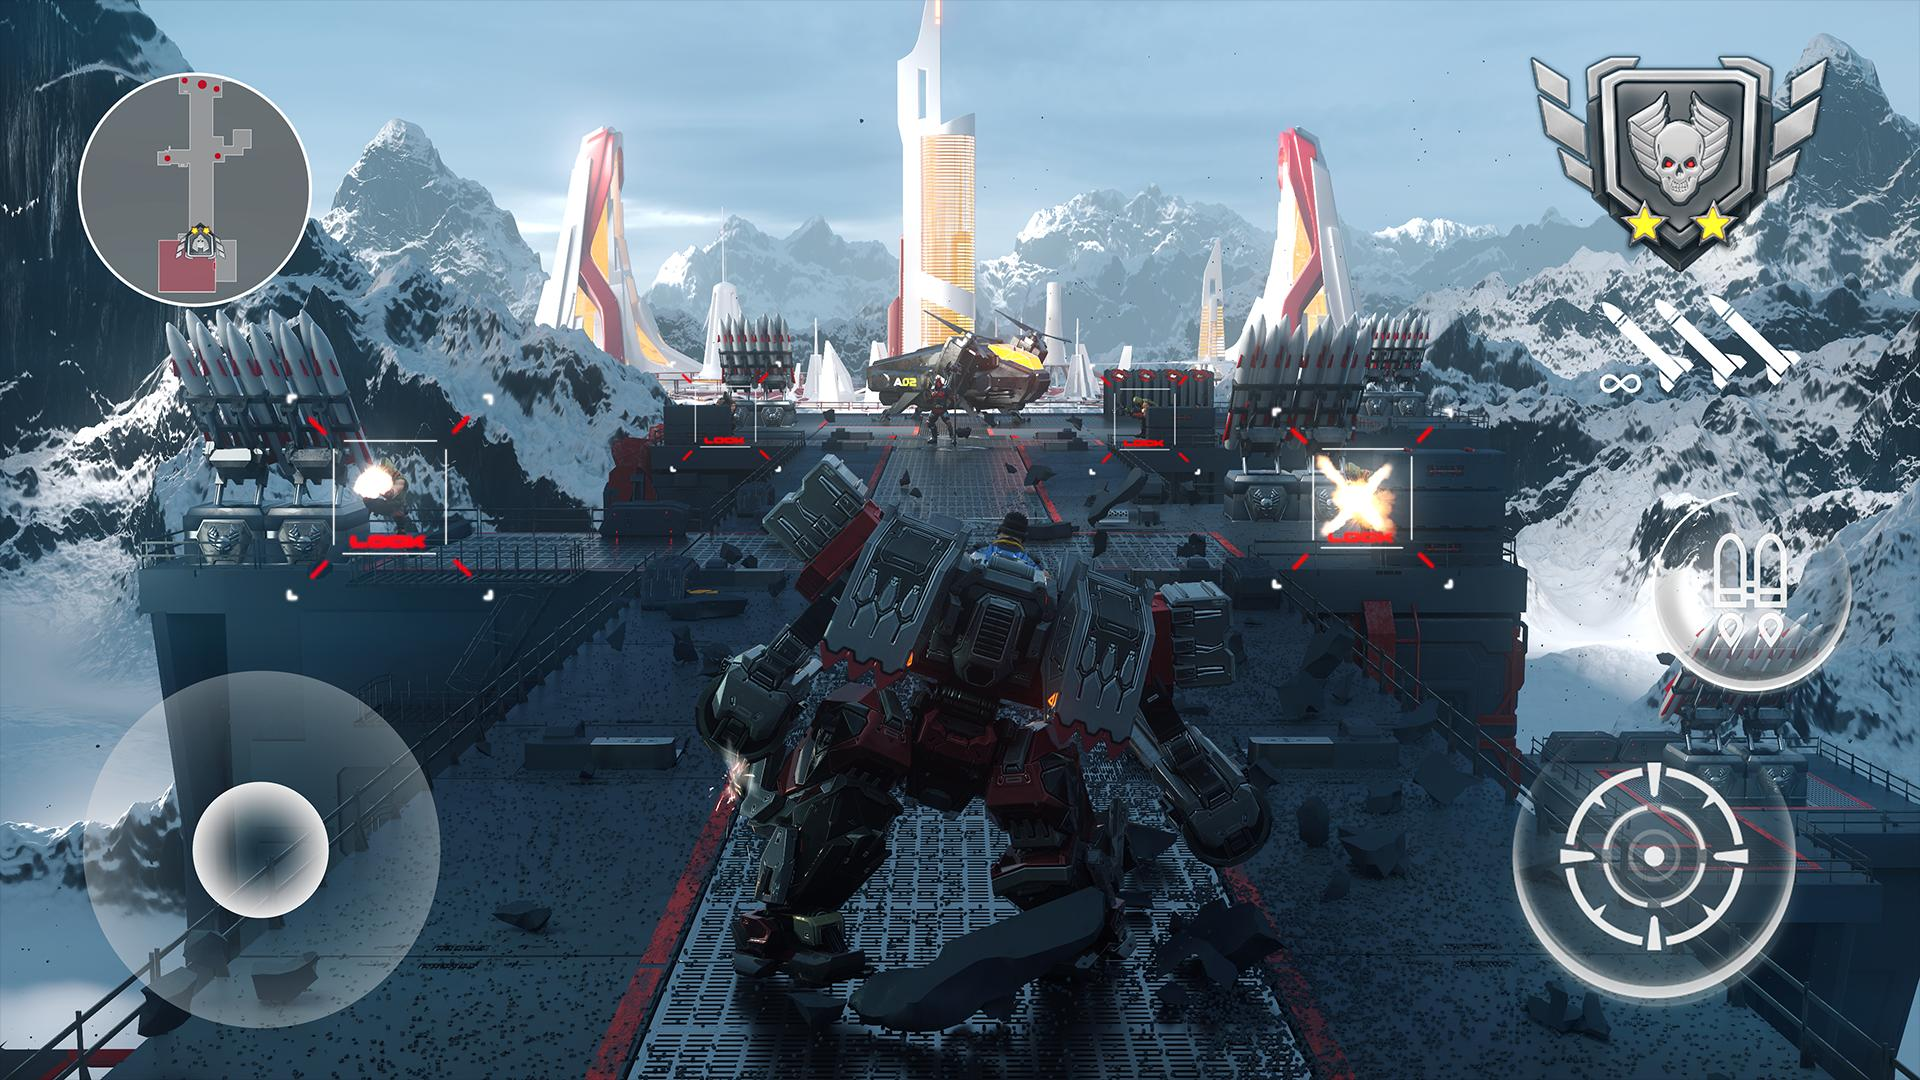 Evolution 2 Battle for Utopia. Action games 0.580.78866 Screenshot 1